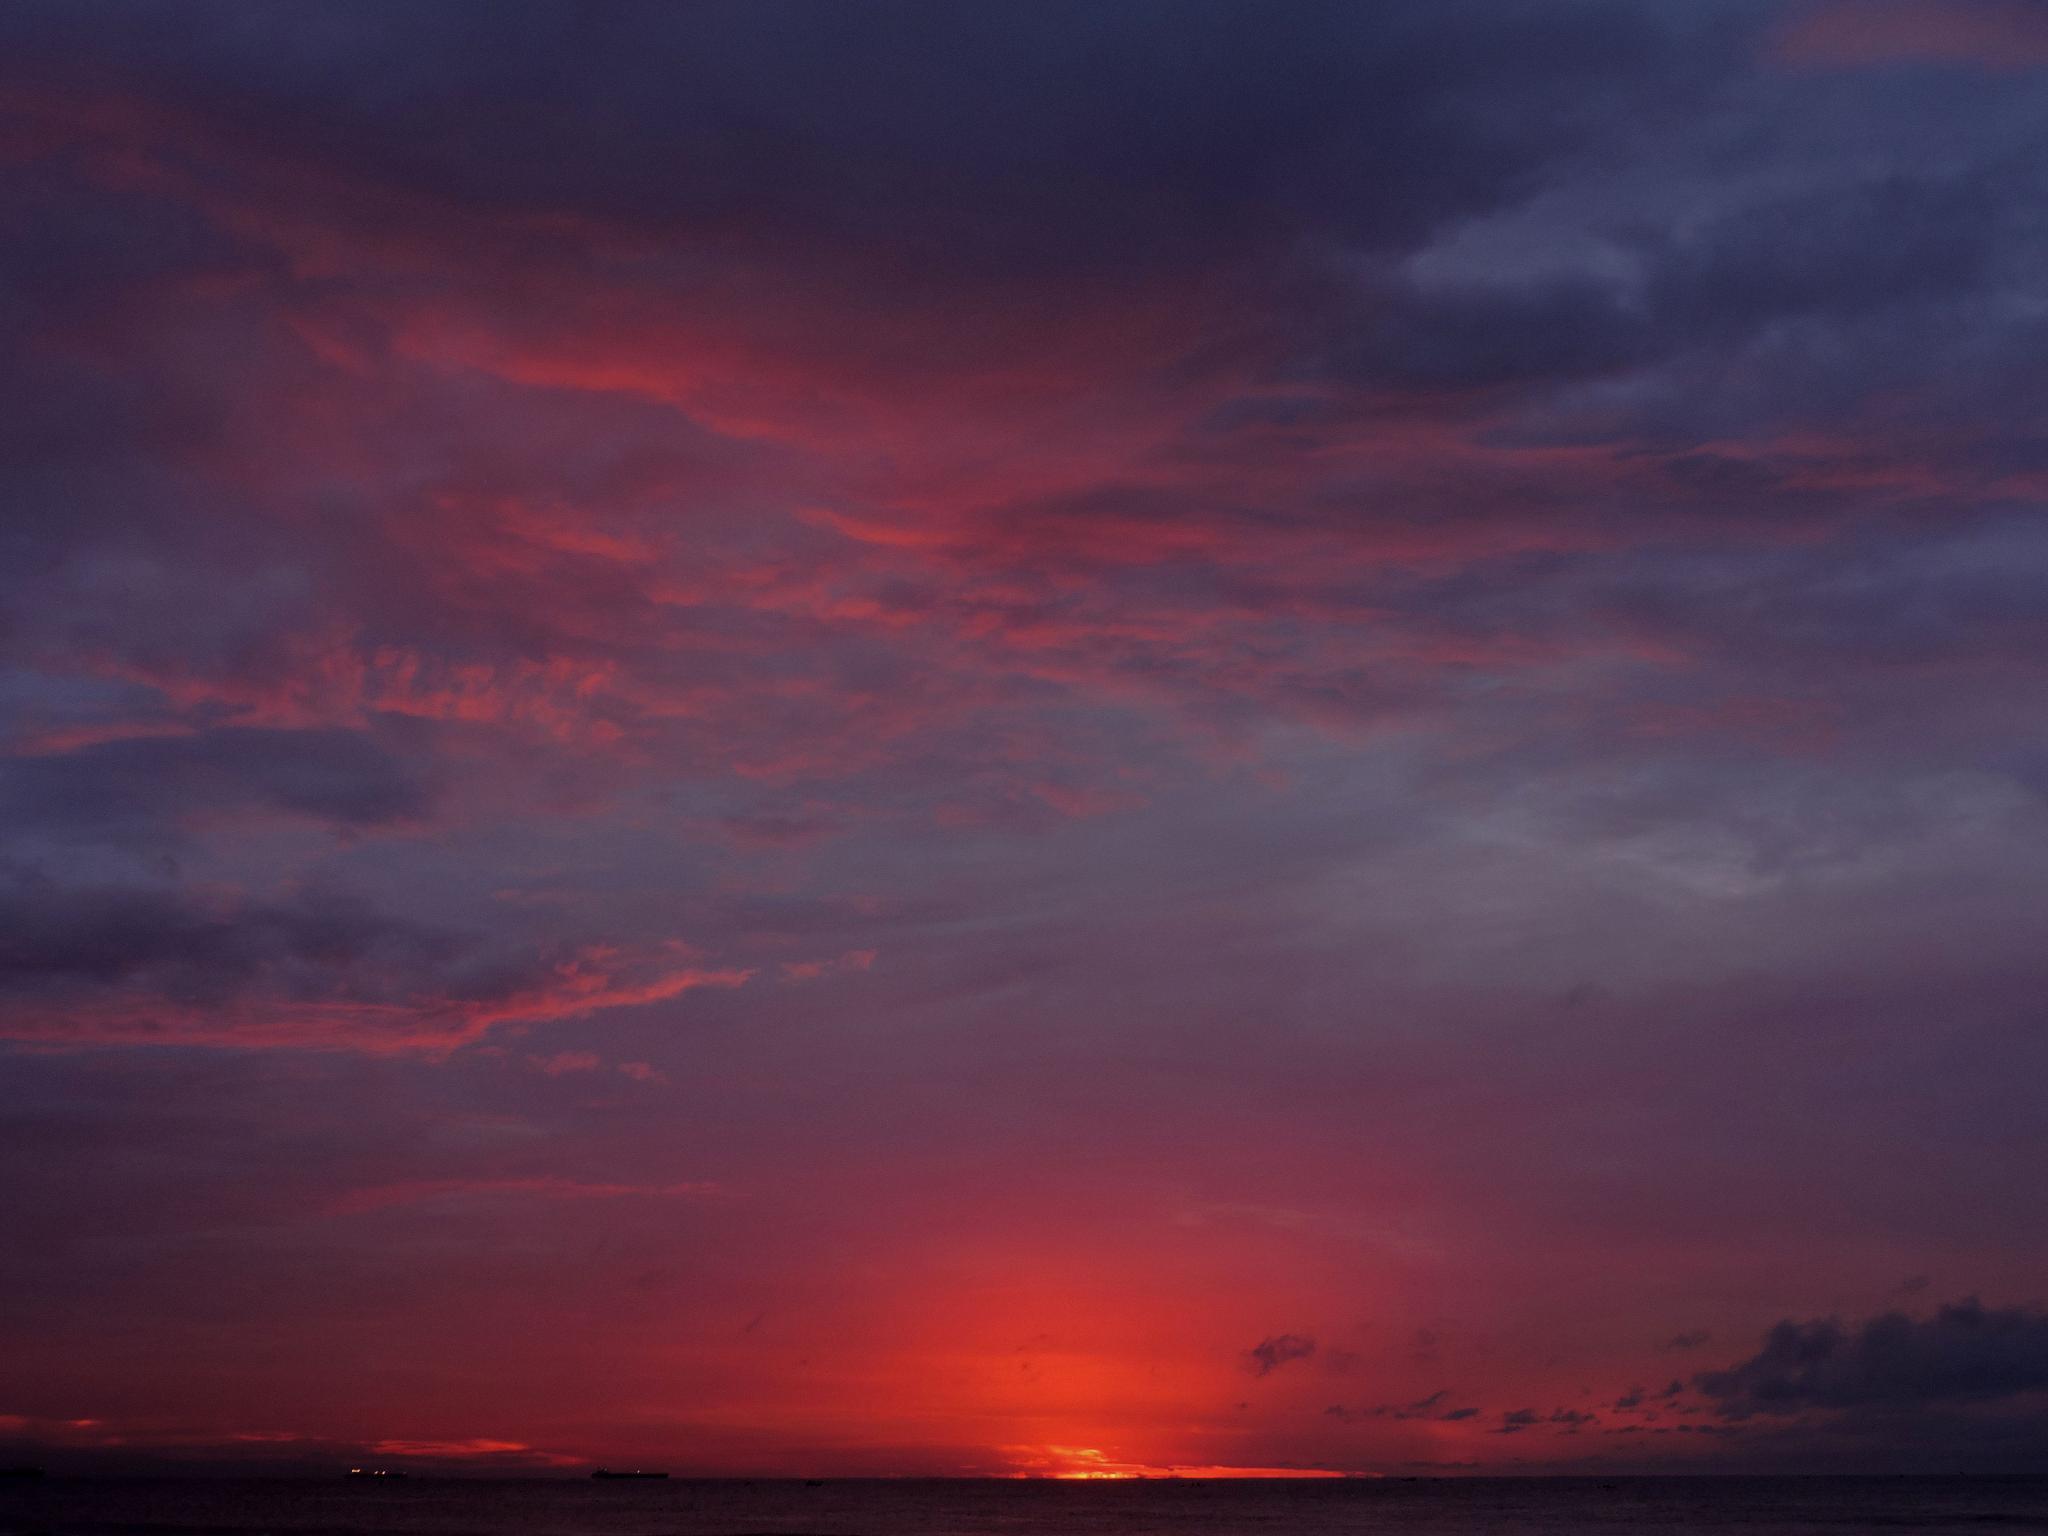 sunrise at 5.45 am, chennai India by annapoorna.sitaram